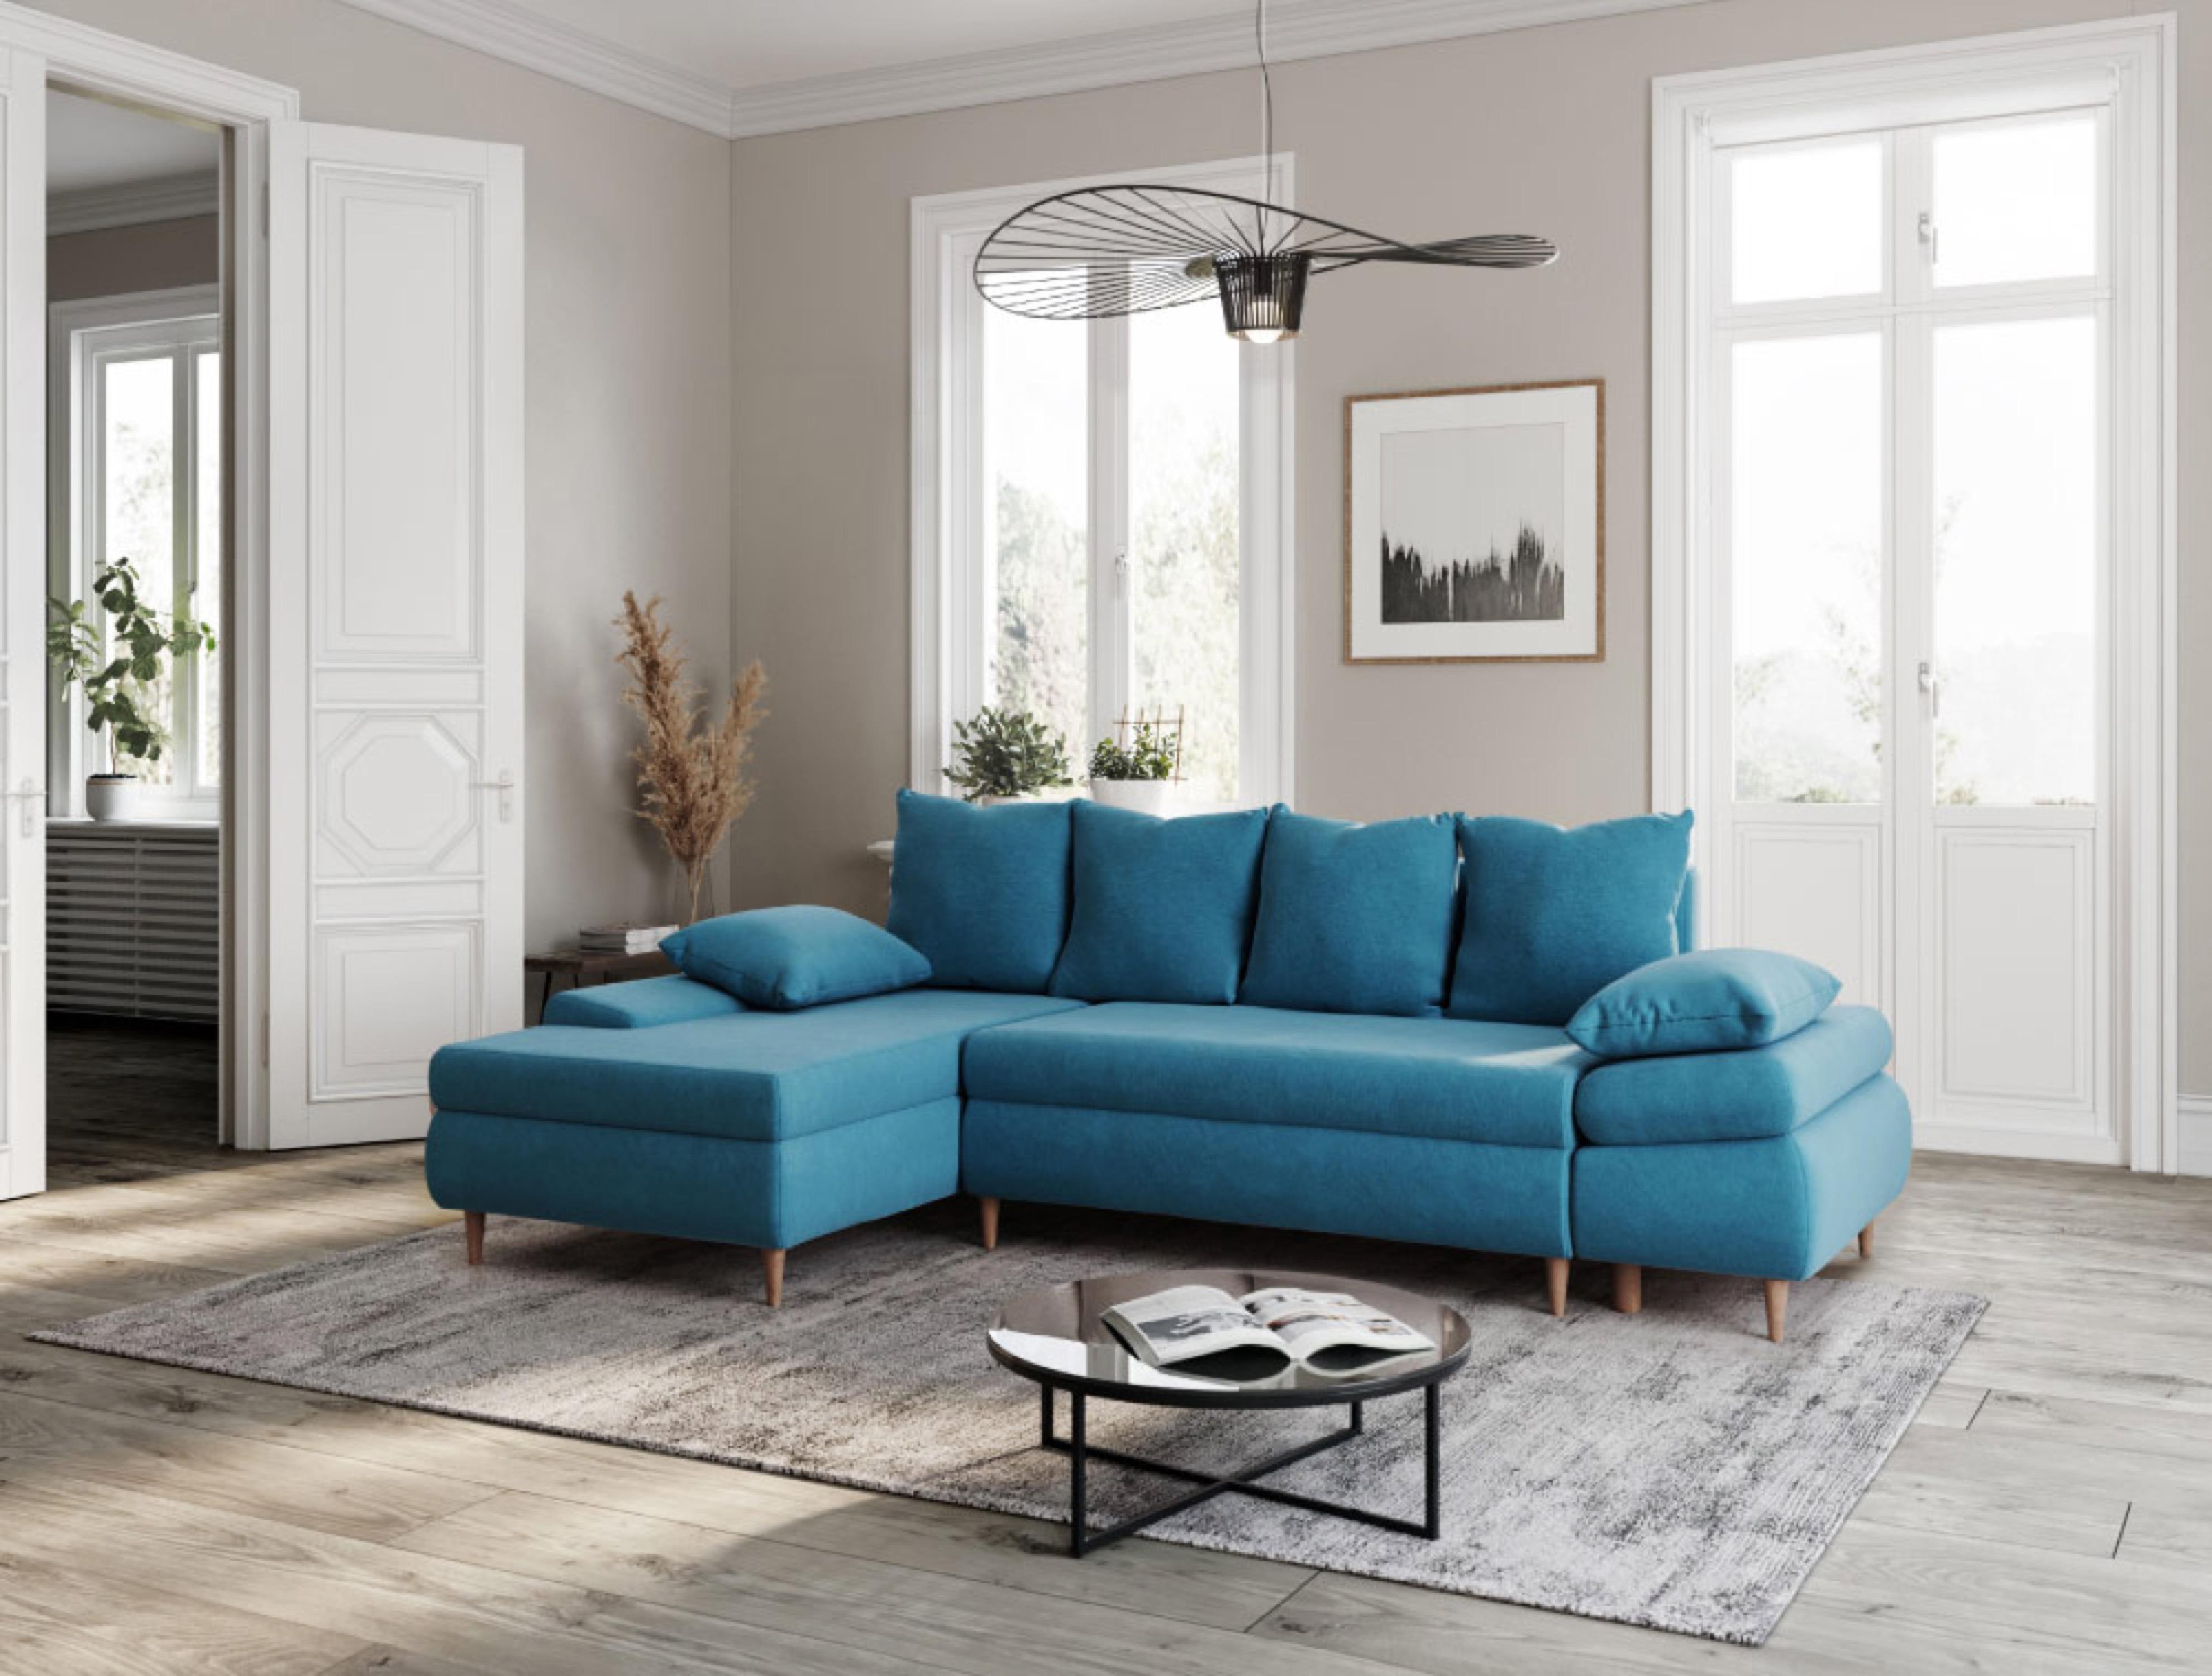 Canapé d'angle gauche convertible 5 places en tissu bleu